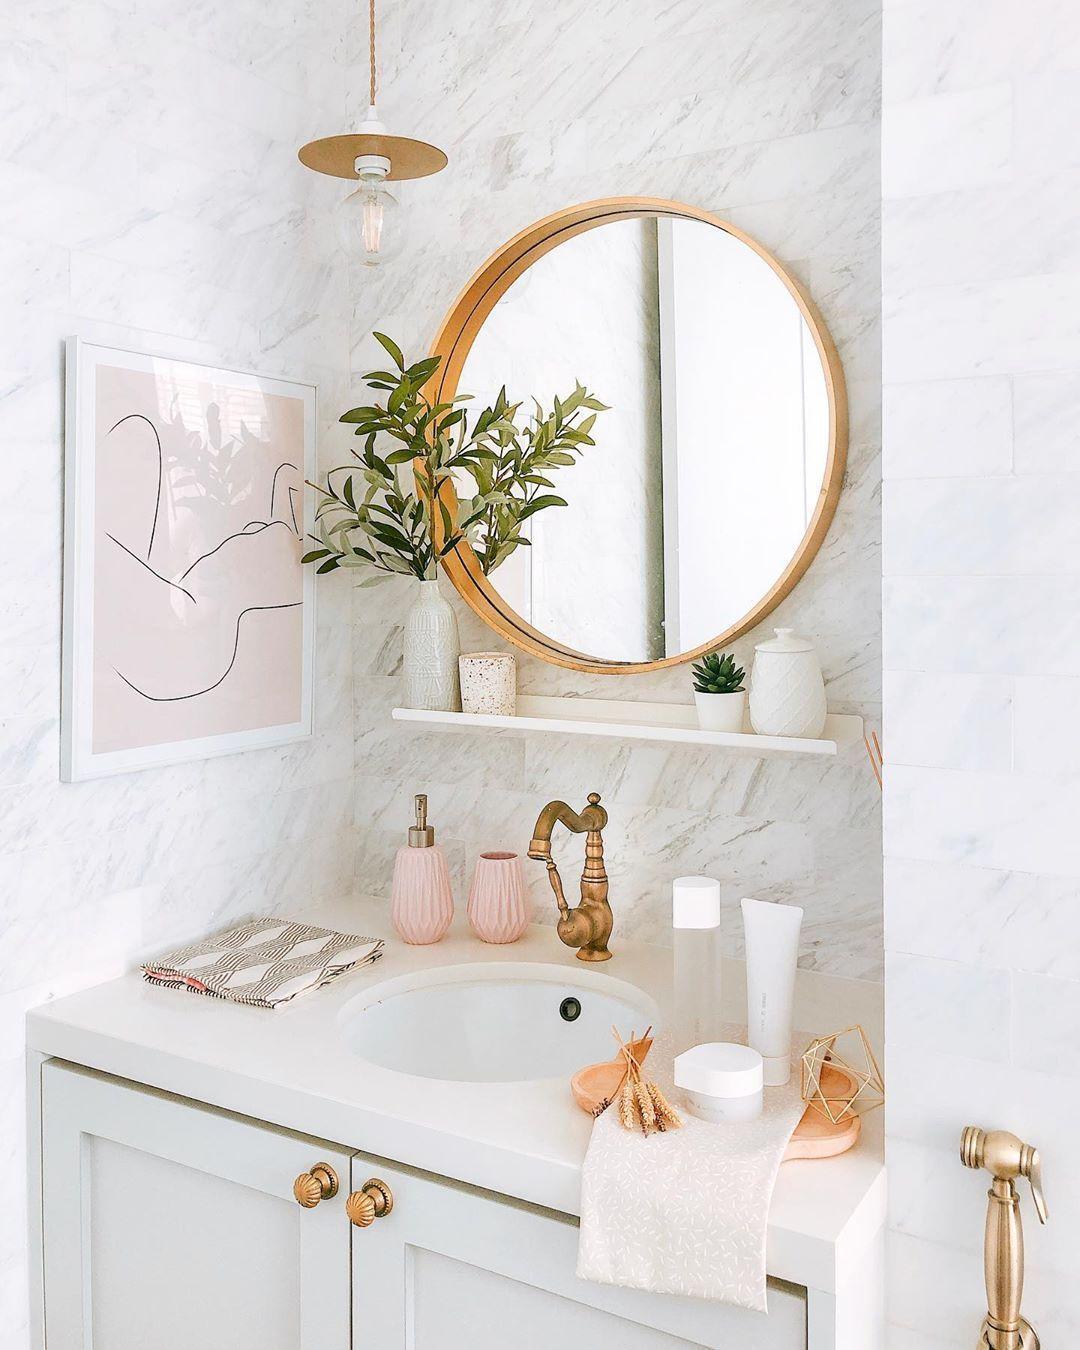 Jade Anthony On Instagram My Makeup Cosmetics Never Made It Onto Ig Because It Looks Like A Warzone Small Bathroom Decor Feminine Bathroom Bathroom Decor Feminine bathroom decorating ideas